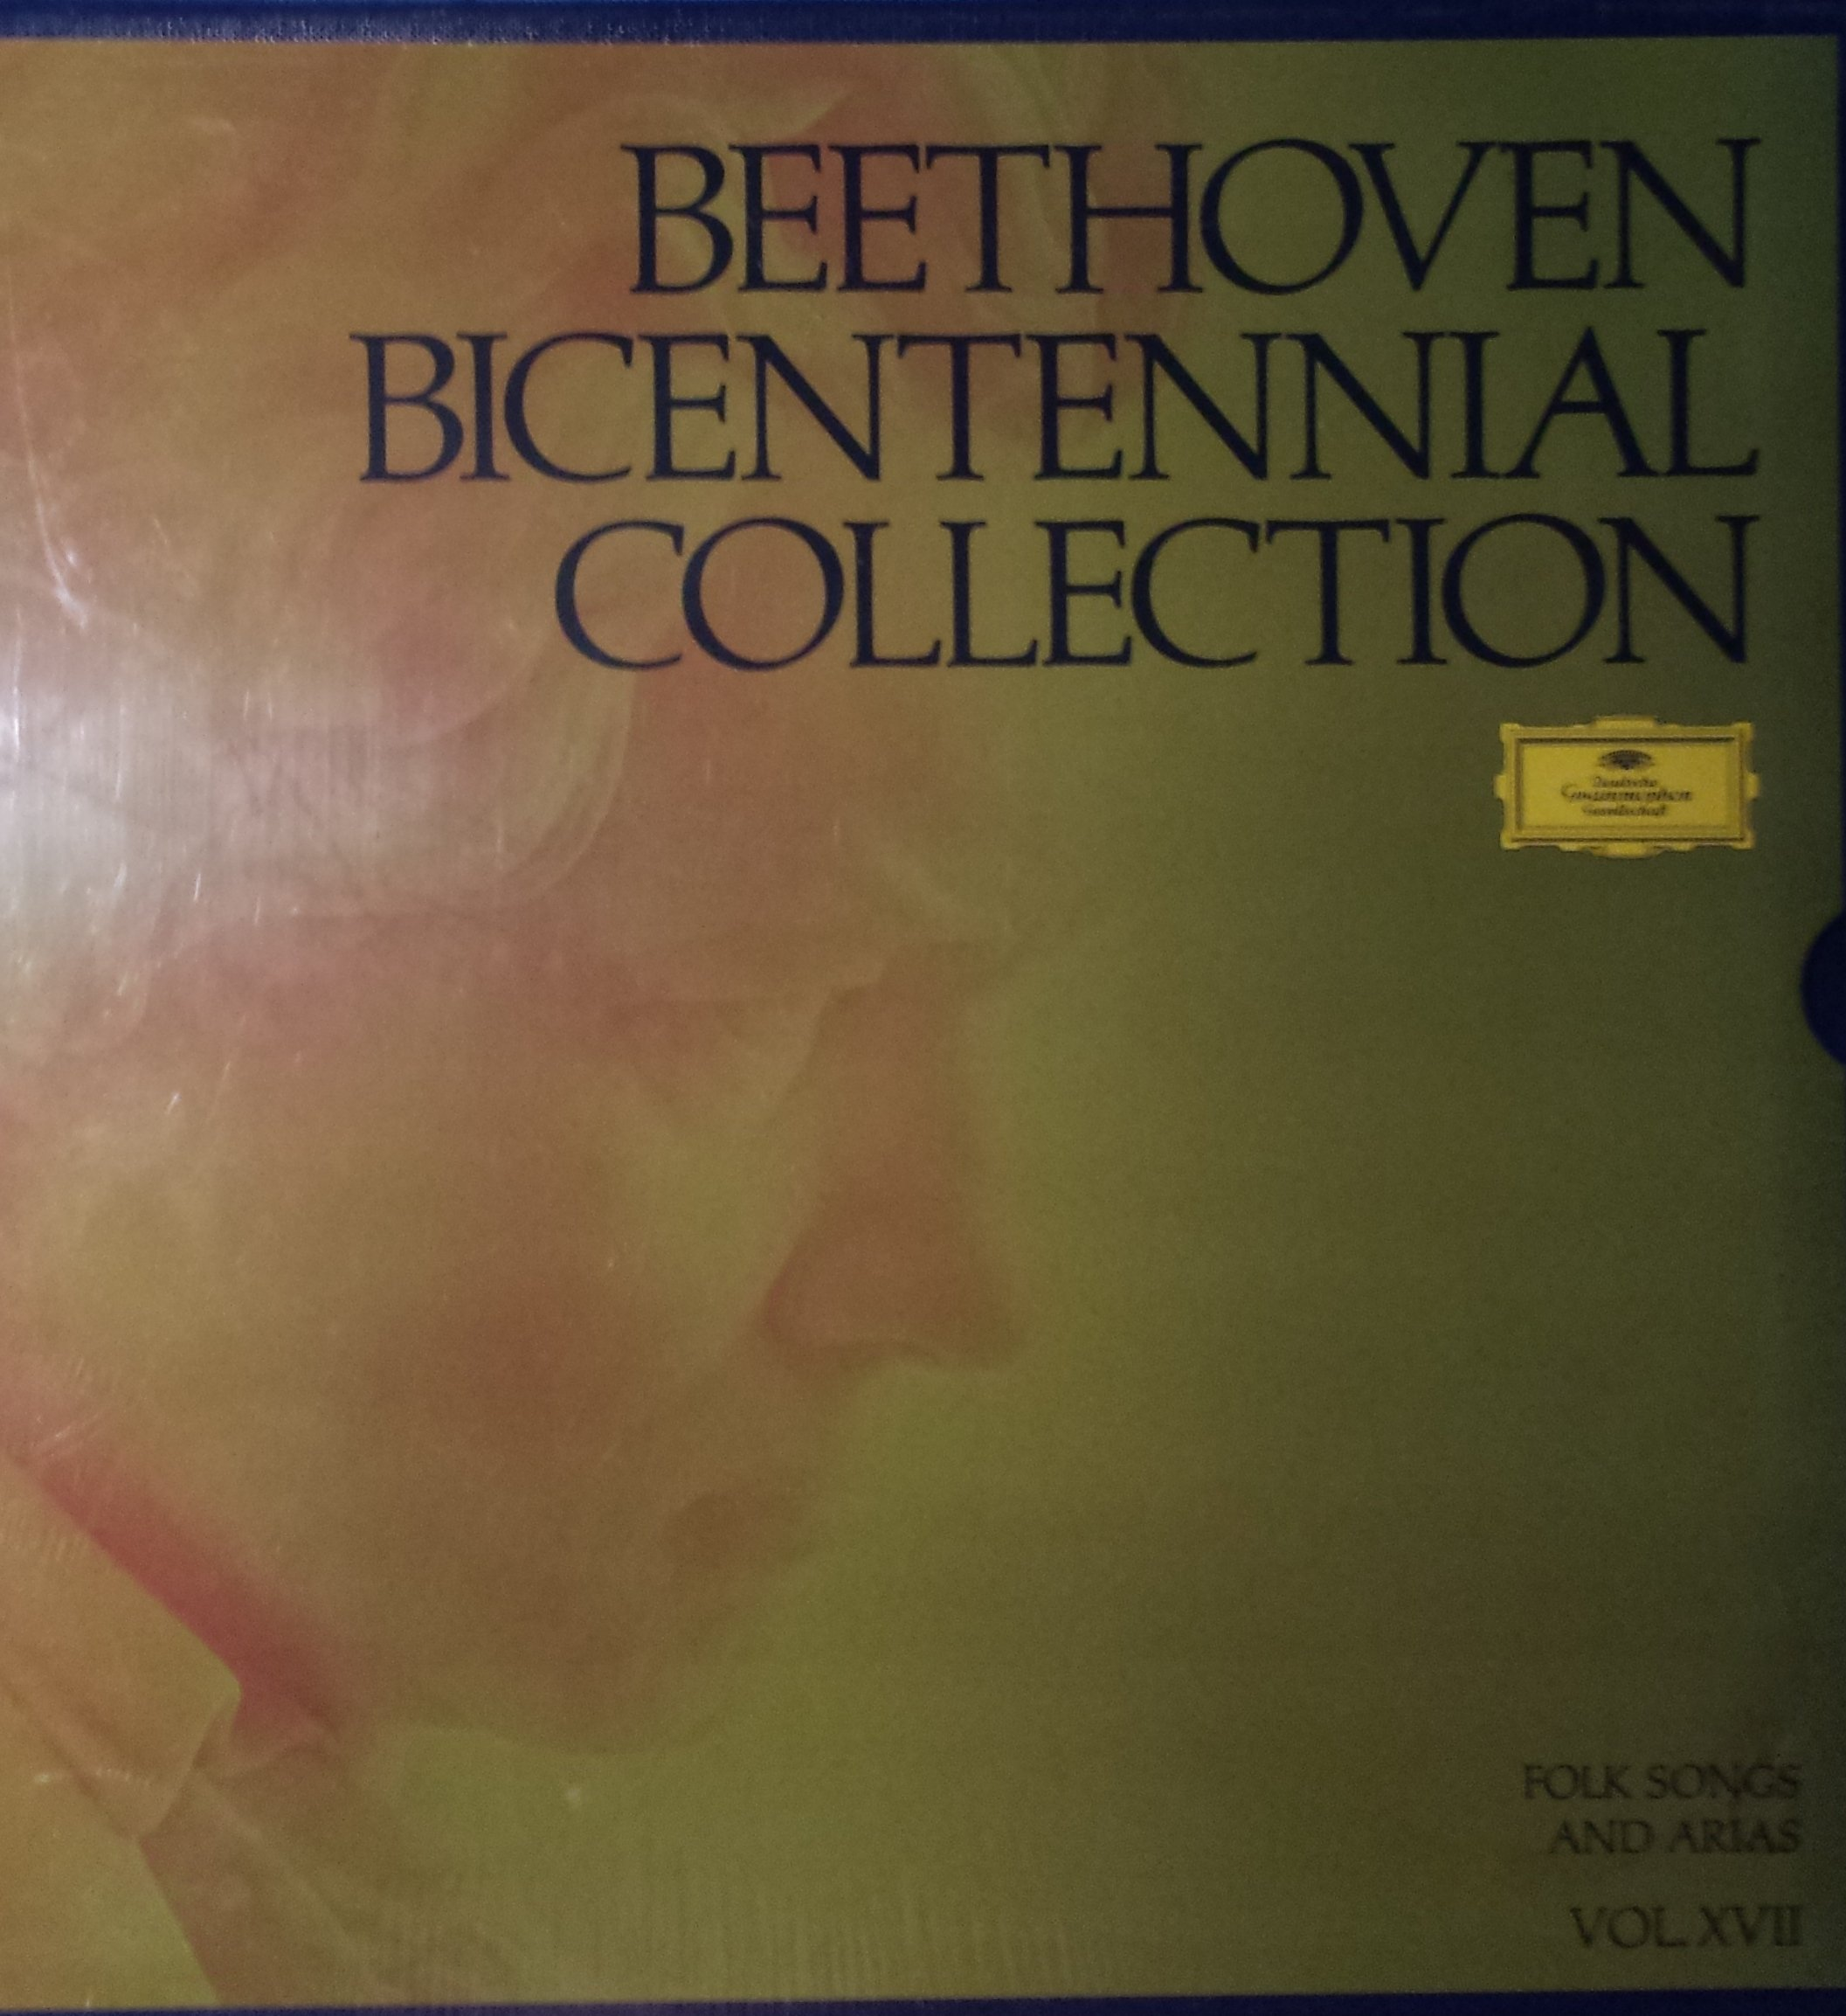 Beethoven Bicentennial Collection Folk Songs and Arias Vol XVII by Deutsche Grammophon Gesselschaft